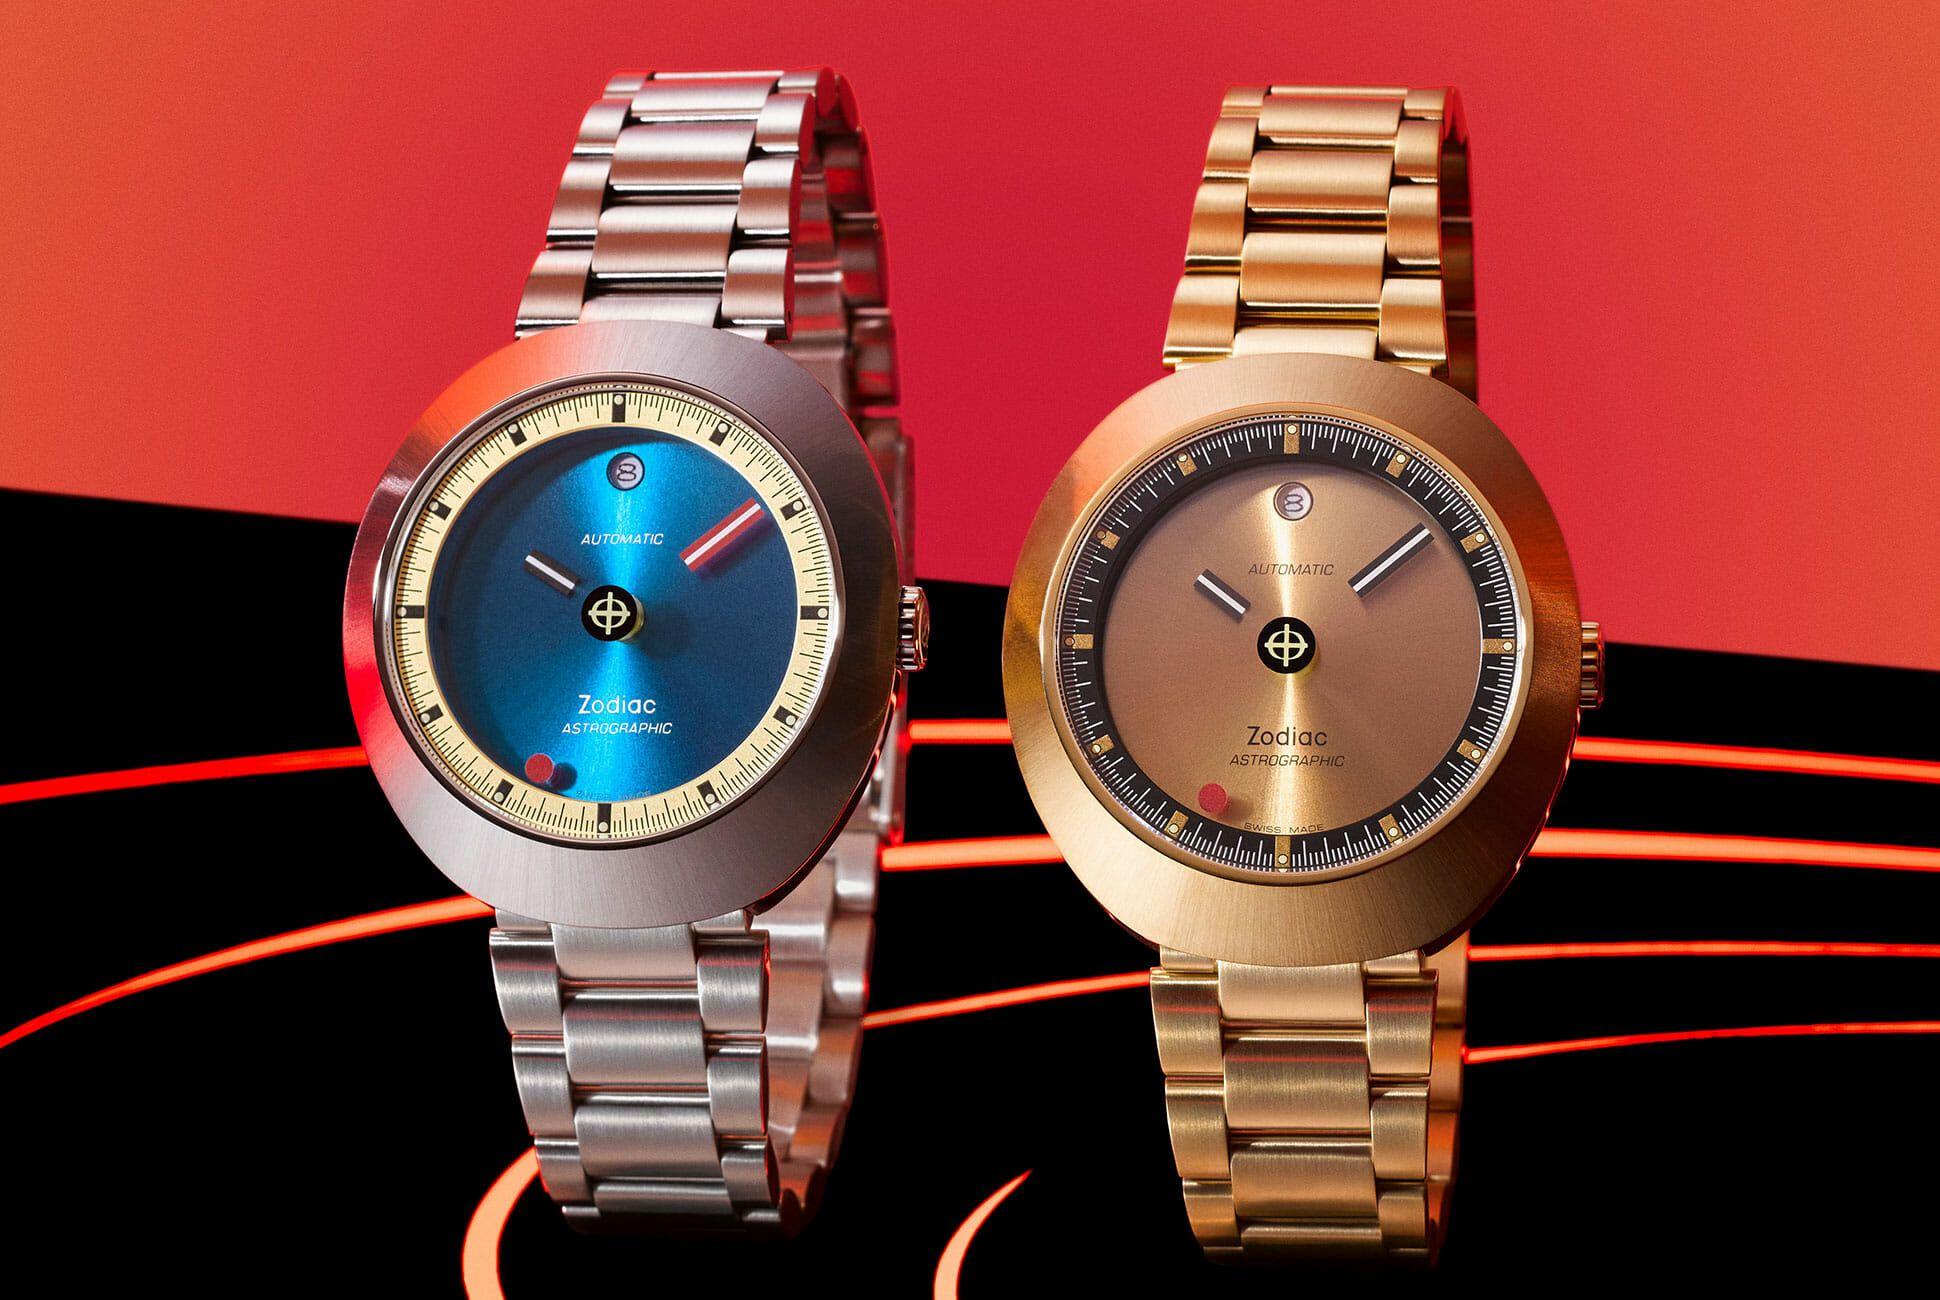 Zodiac-Astrographic-Watch-gear-patrol-slide-1